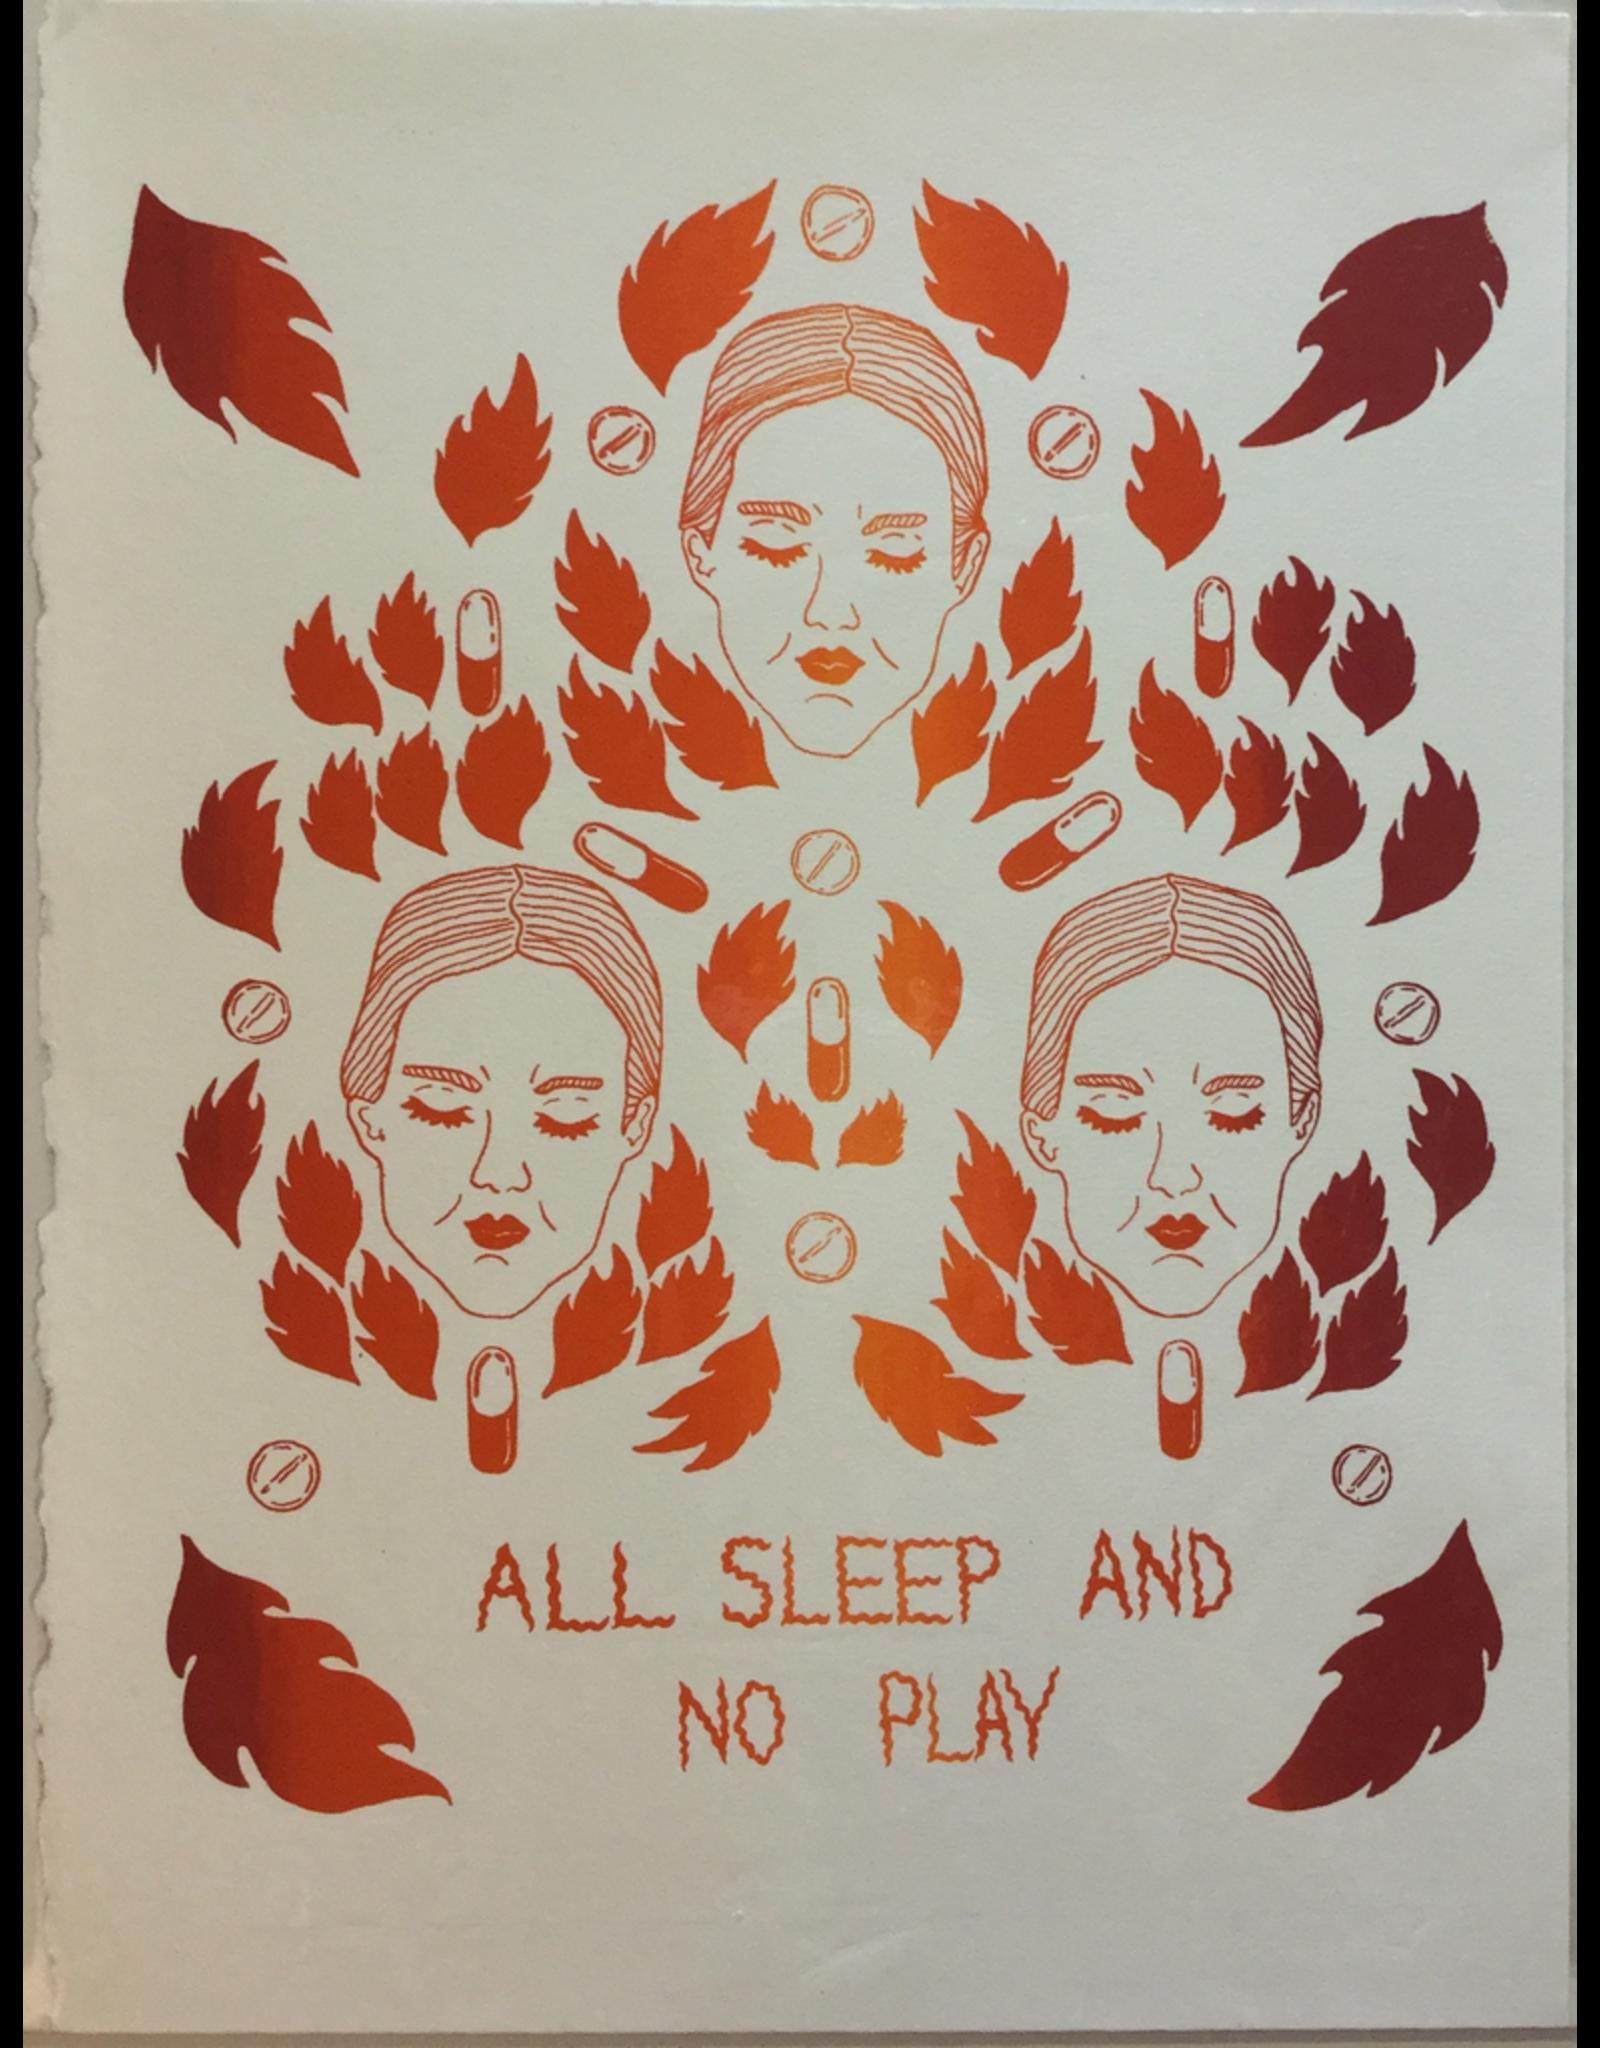 Mayer, Emma All Sleep No Play, Print